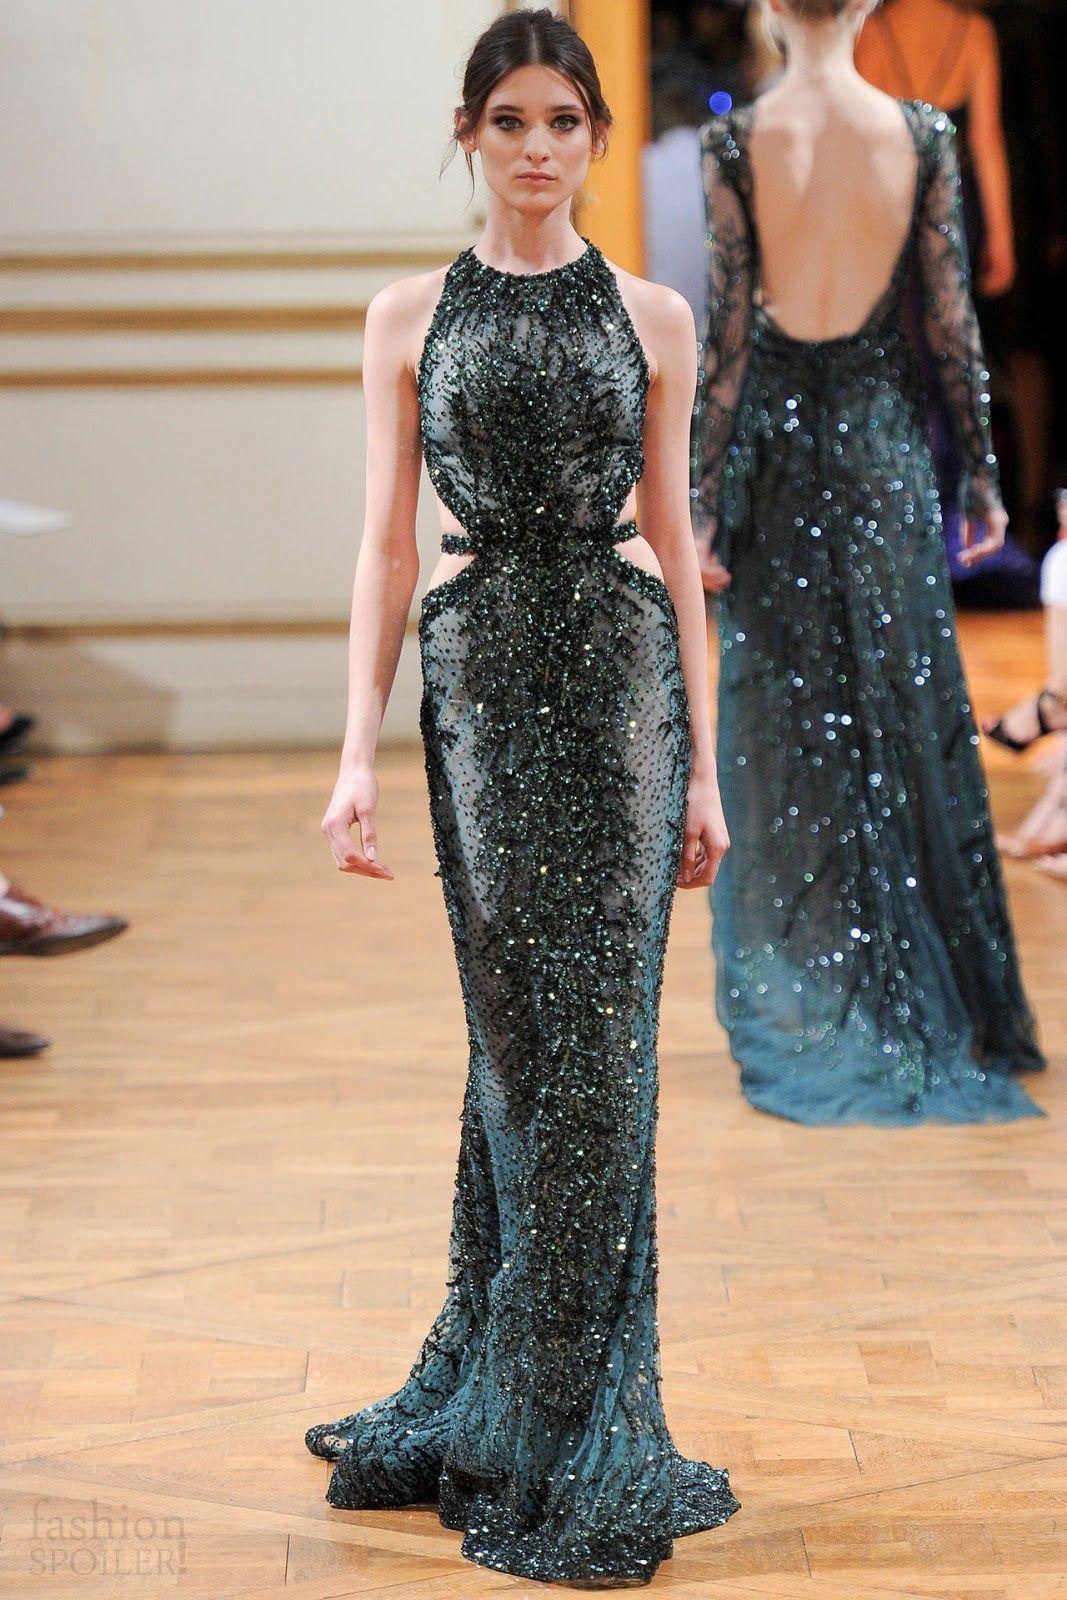 Zuhair Murad Haute Couture 2015 | Zuhair Murad Haute Couture - Outono/Inverno 2013/2014